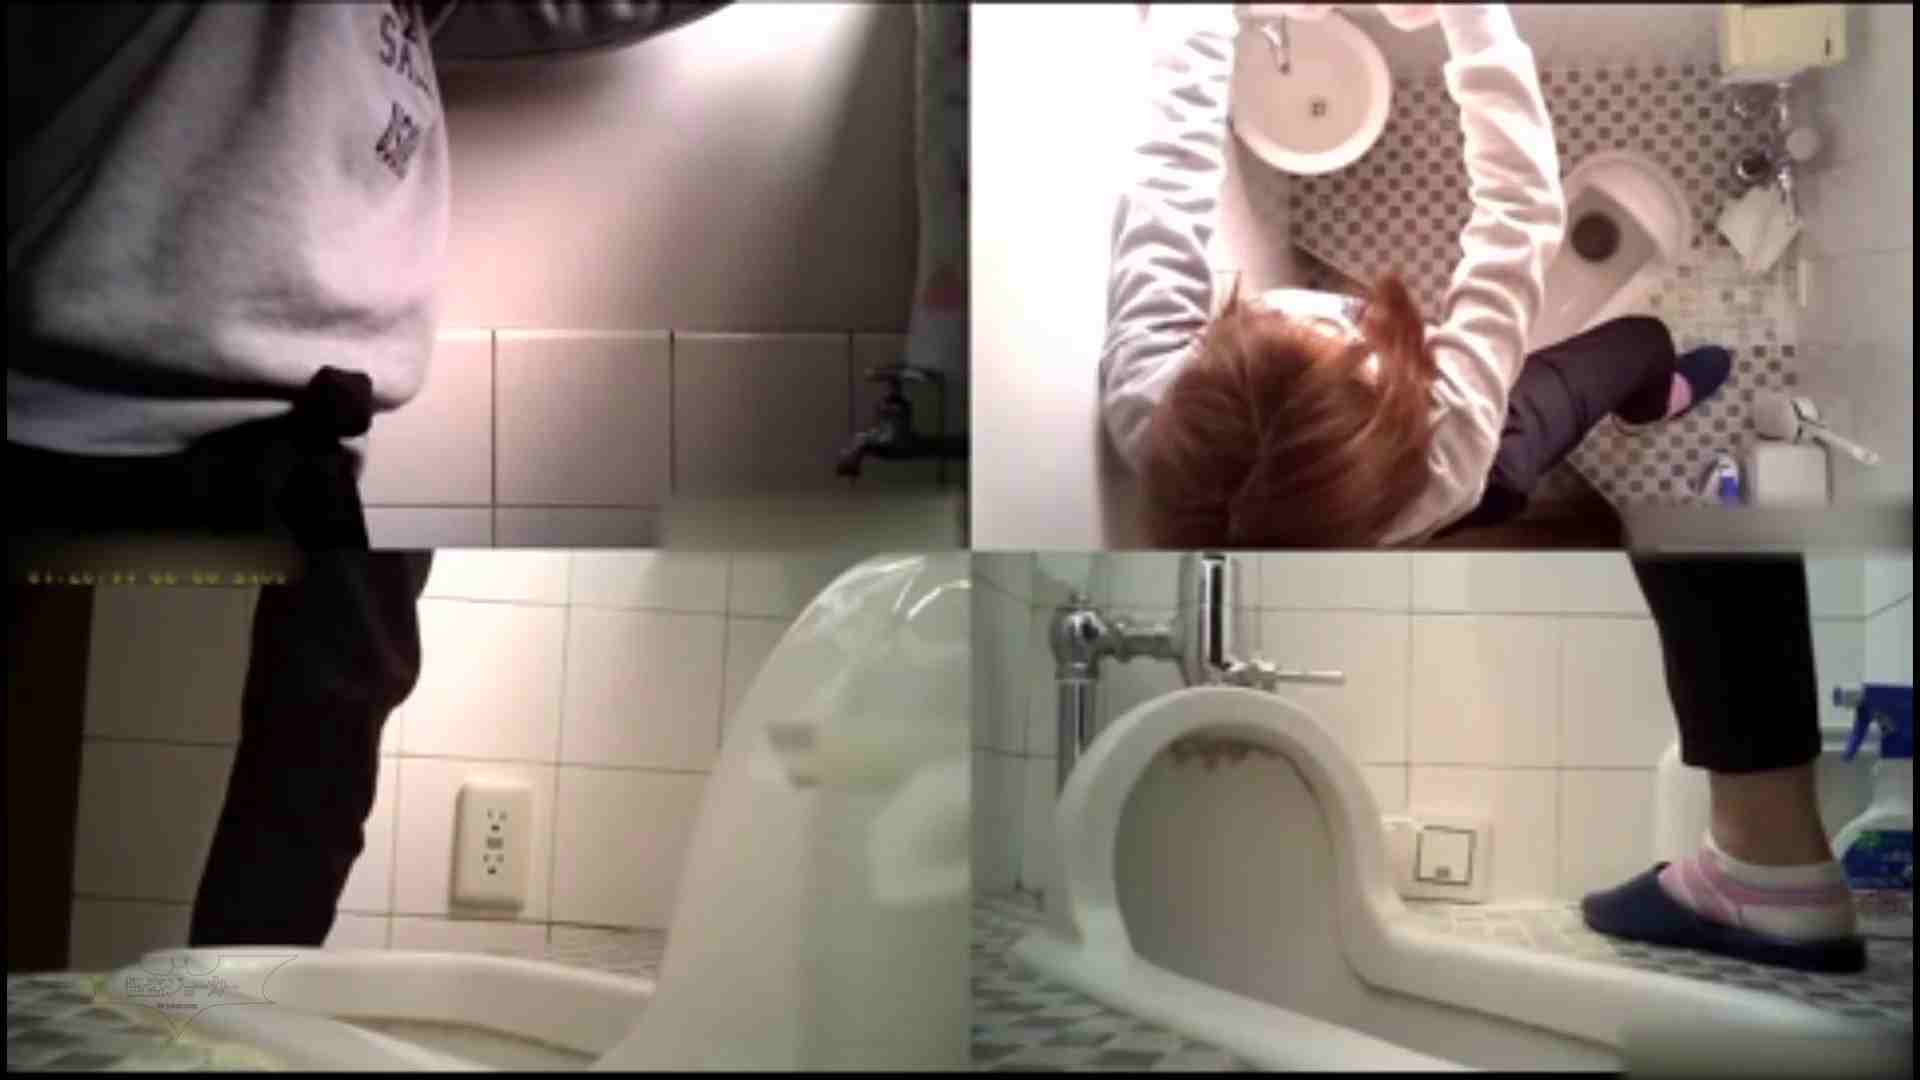 Vol.05 花の女子大生 トイレ恥態 進化系マルチアングル!! トイレ中   女子大生達のヌード  38連発 27